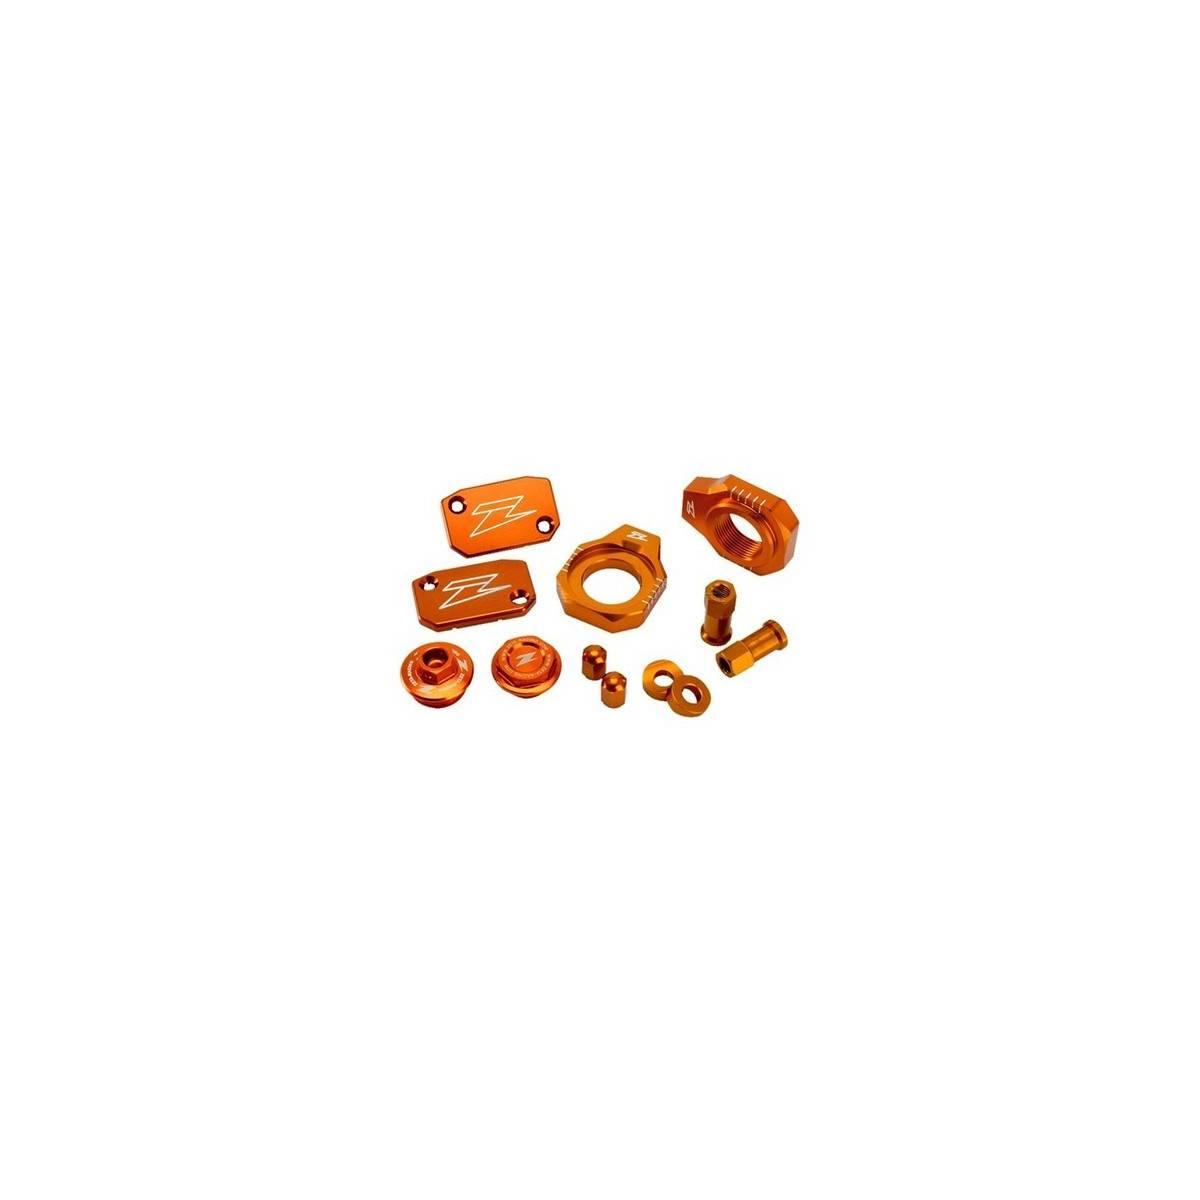 ZE51.2443 - Kit Completo Ktm Sxf Xcf´13 Naranja